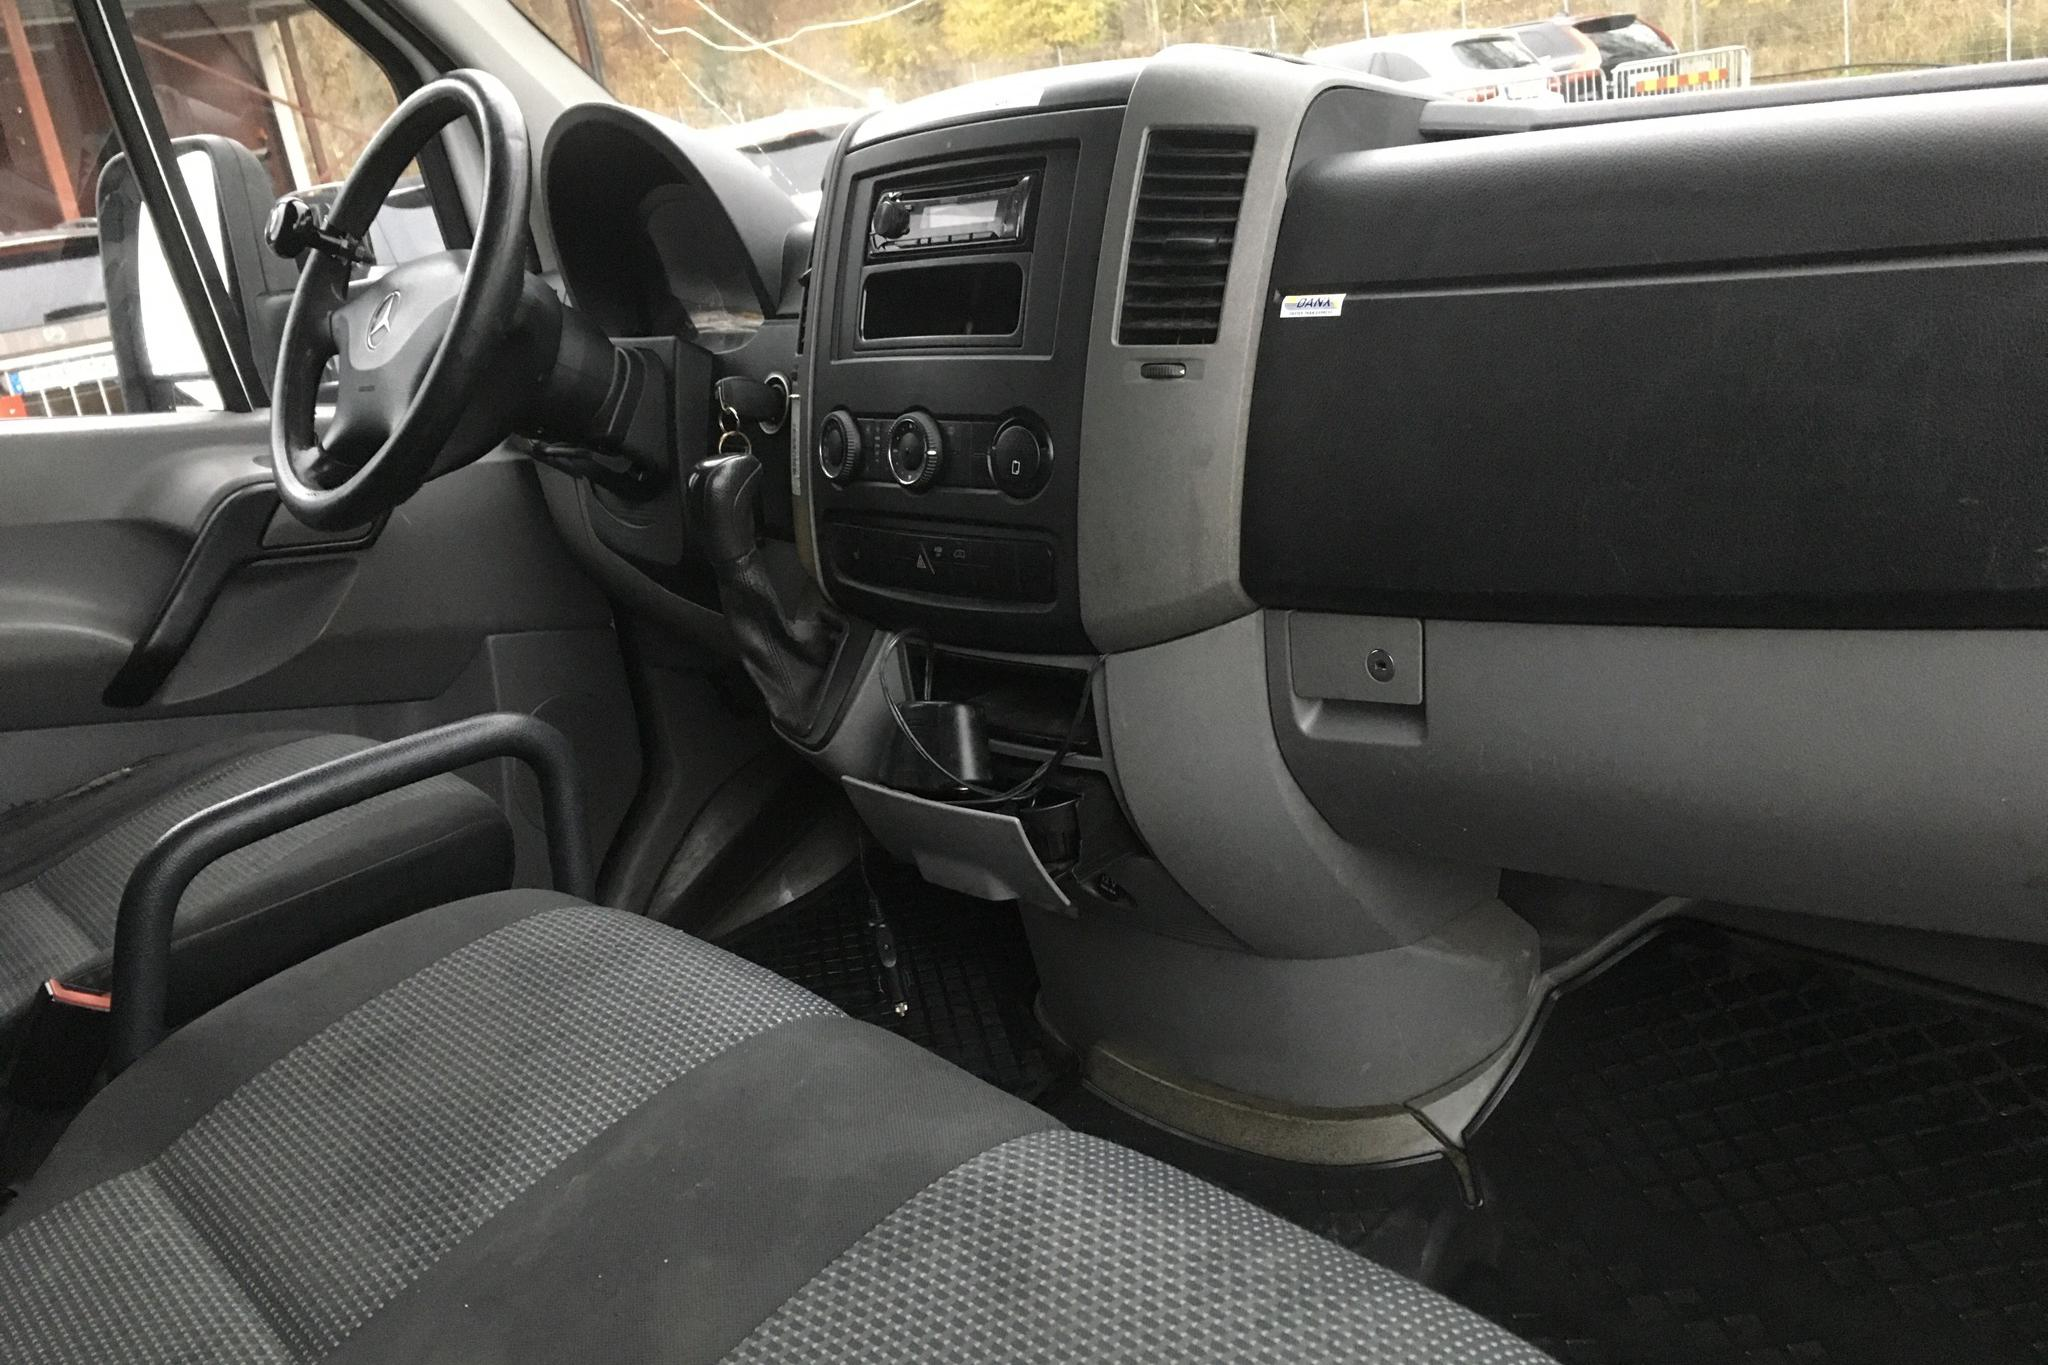 Mercedes Sprinter 319 CDI Pickup/Chassi (190hk) - 49 158 mil - Automat - vit - 2011